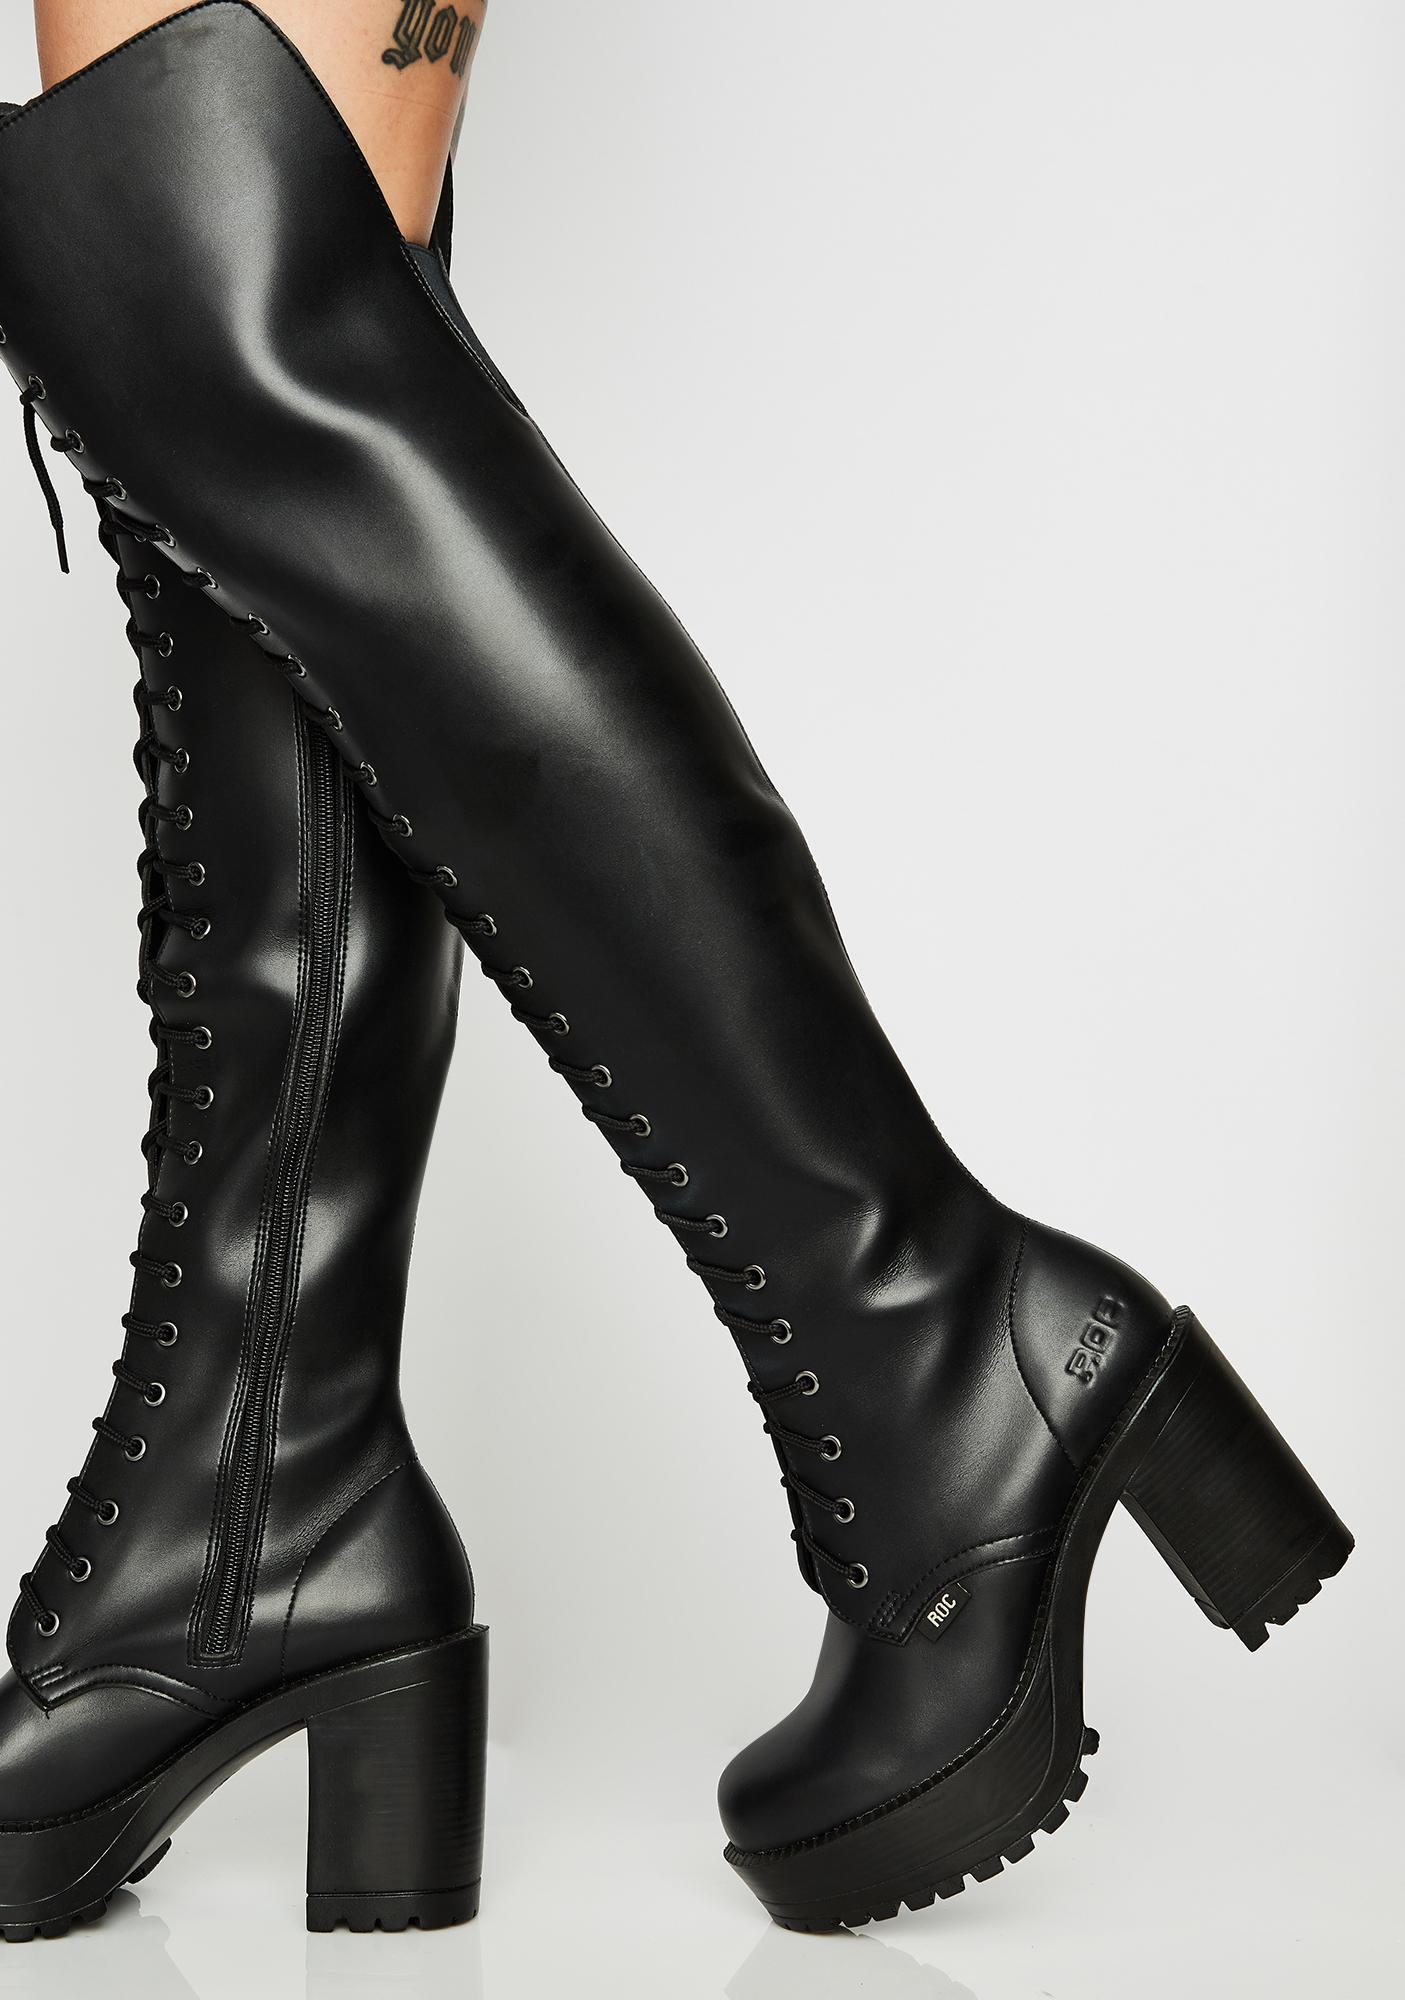 ROC Boots Australia Lavish Thigh High Boots